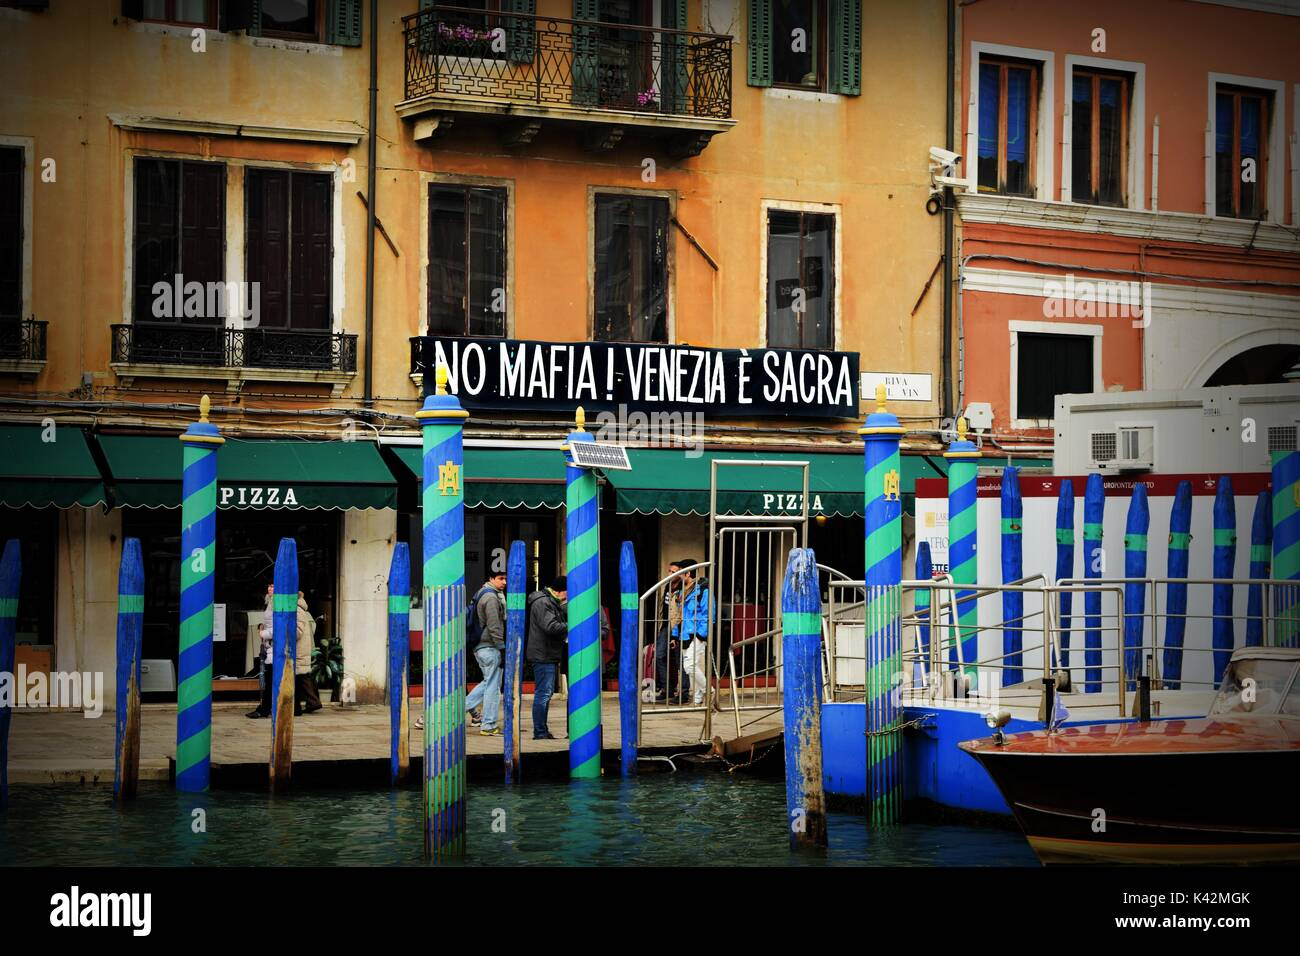 A banner on a house along Venice's Grand Canal saying 'No Mafia! Venezia E' Sacra', near Rialto Bridge - Stock Image